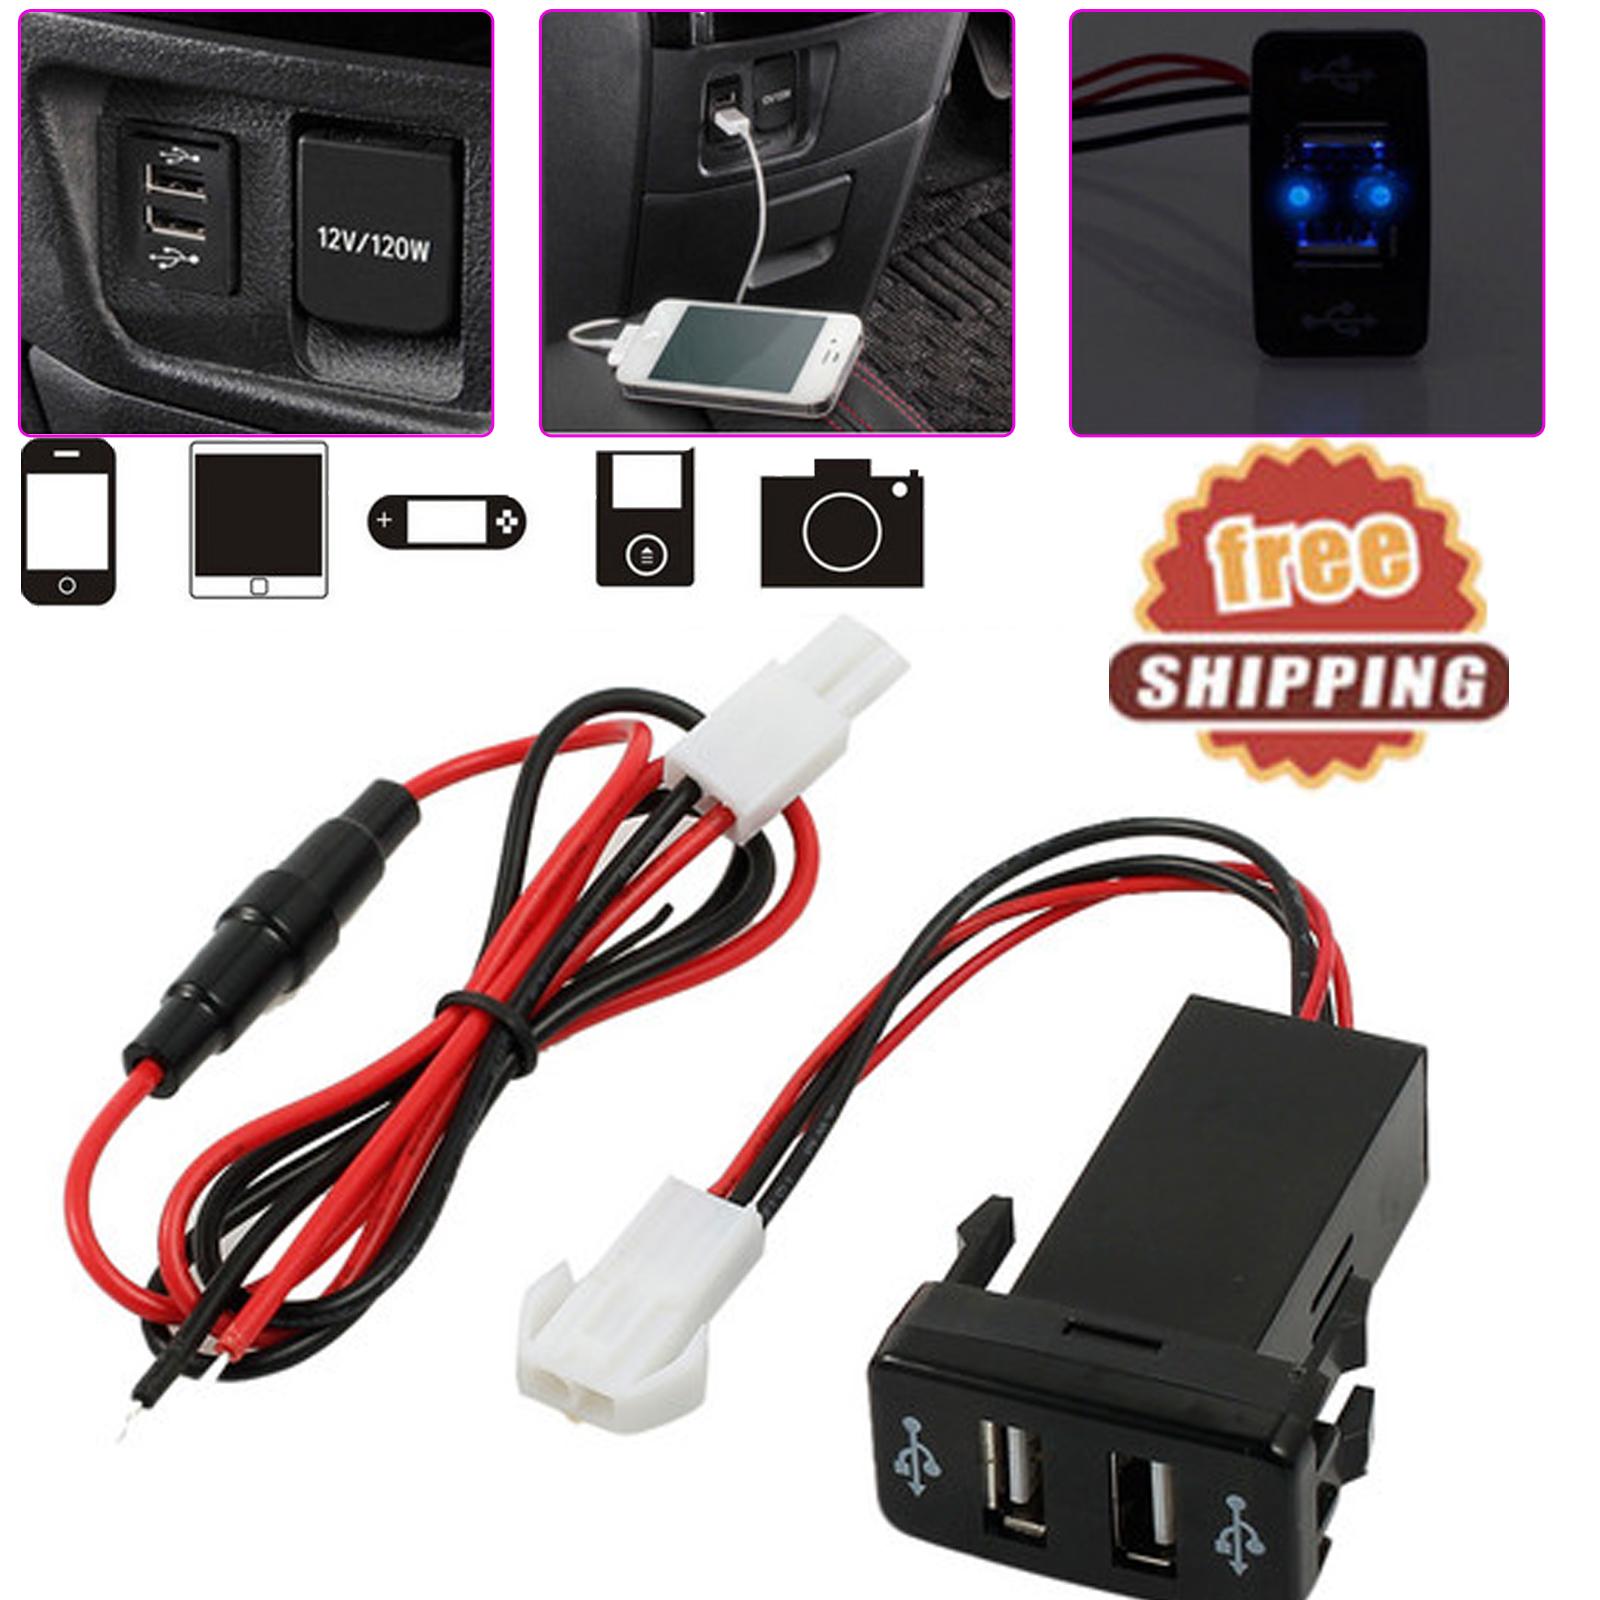 hight resolution of details about usb car charger adapter double dual 2 port car socket lighter 12v 24v for toyota